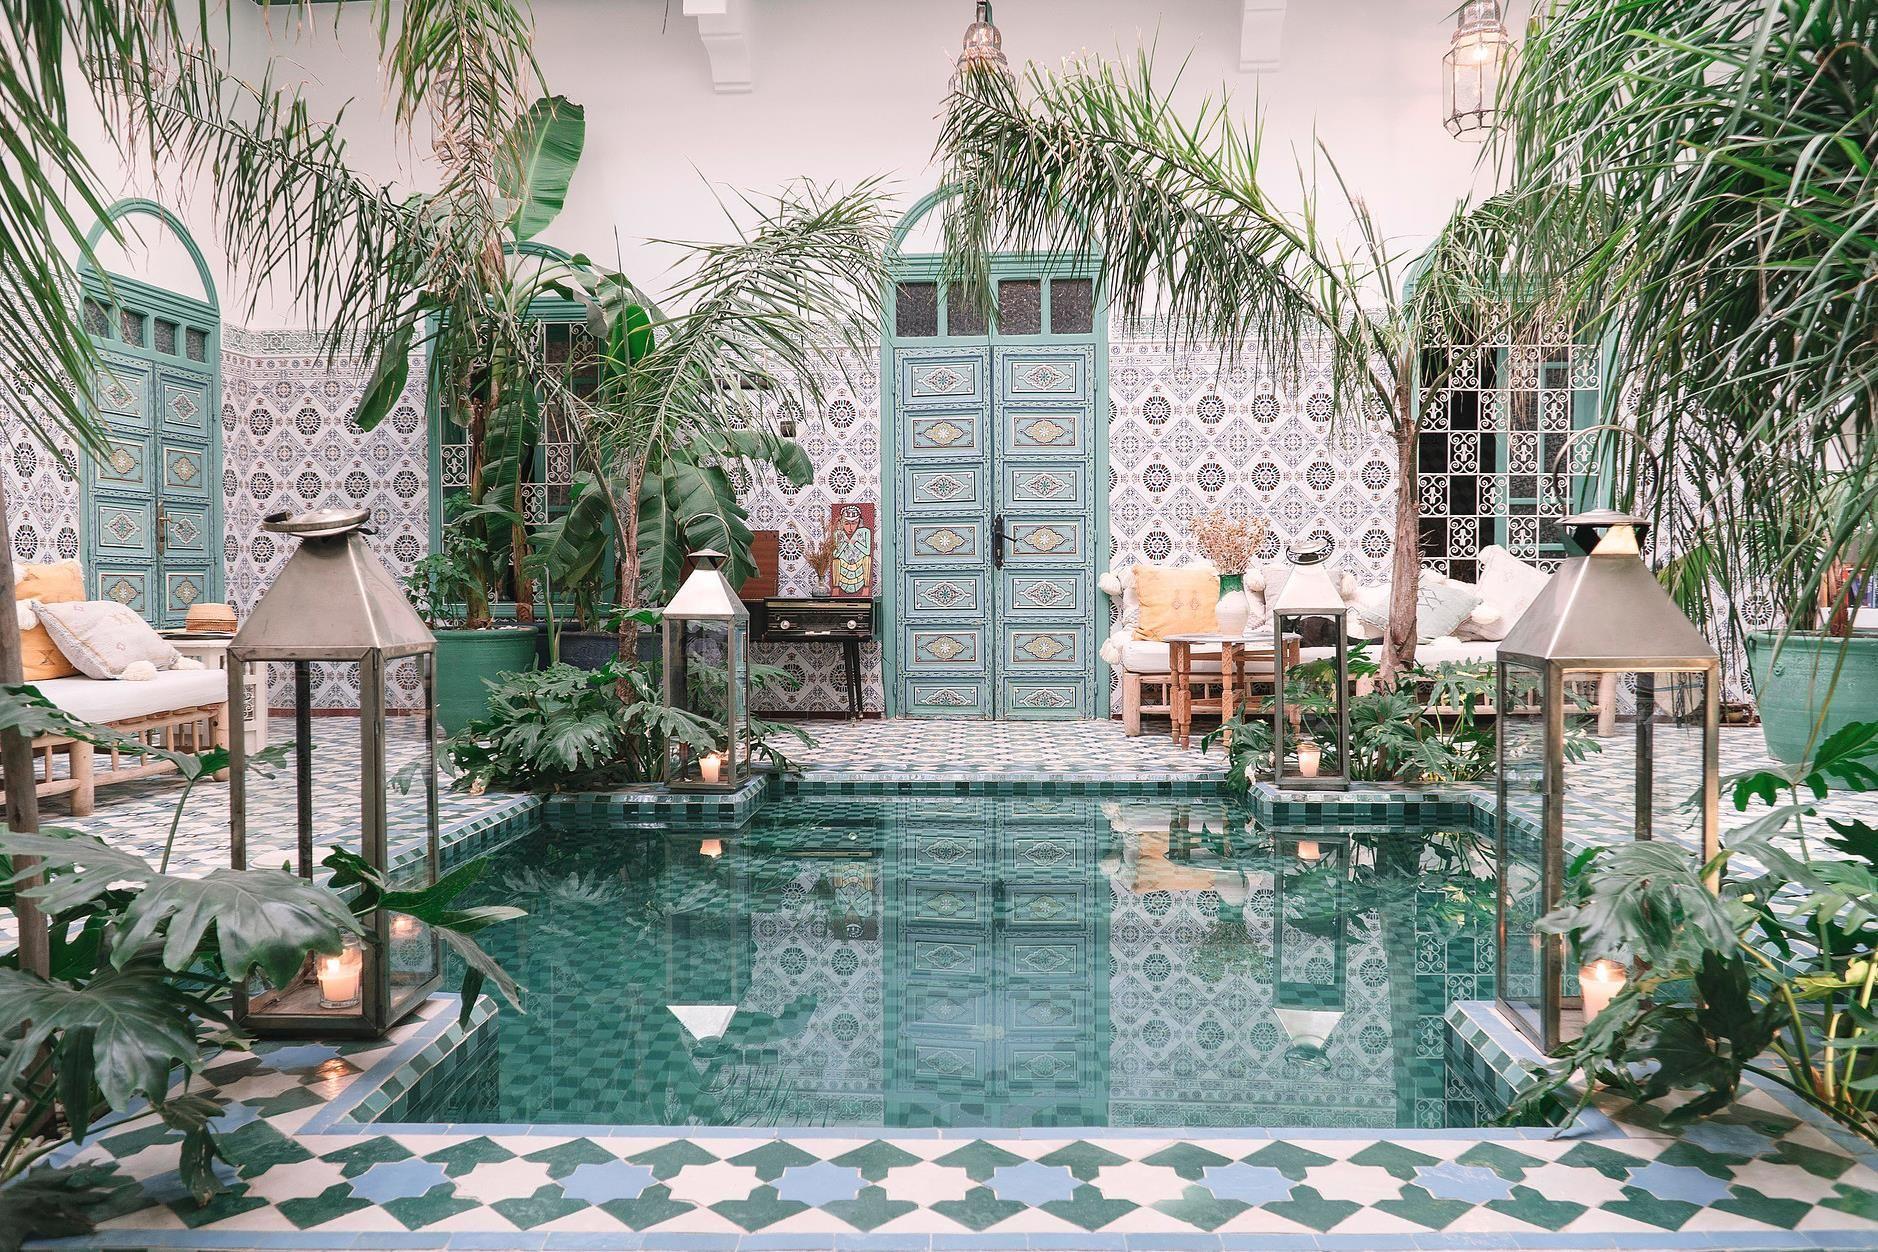 Inspirierender Yoga-Urlaub in Marrakesch (Marokko ...